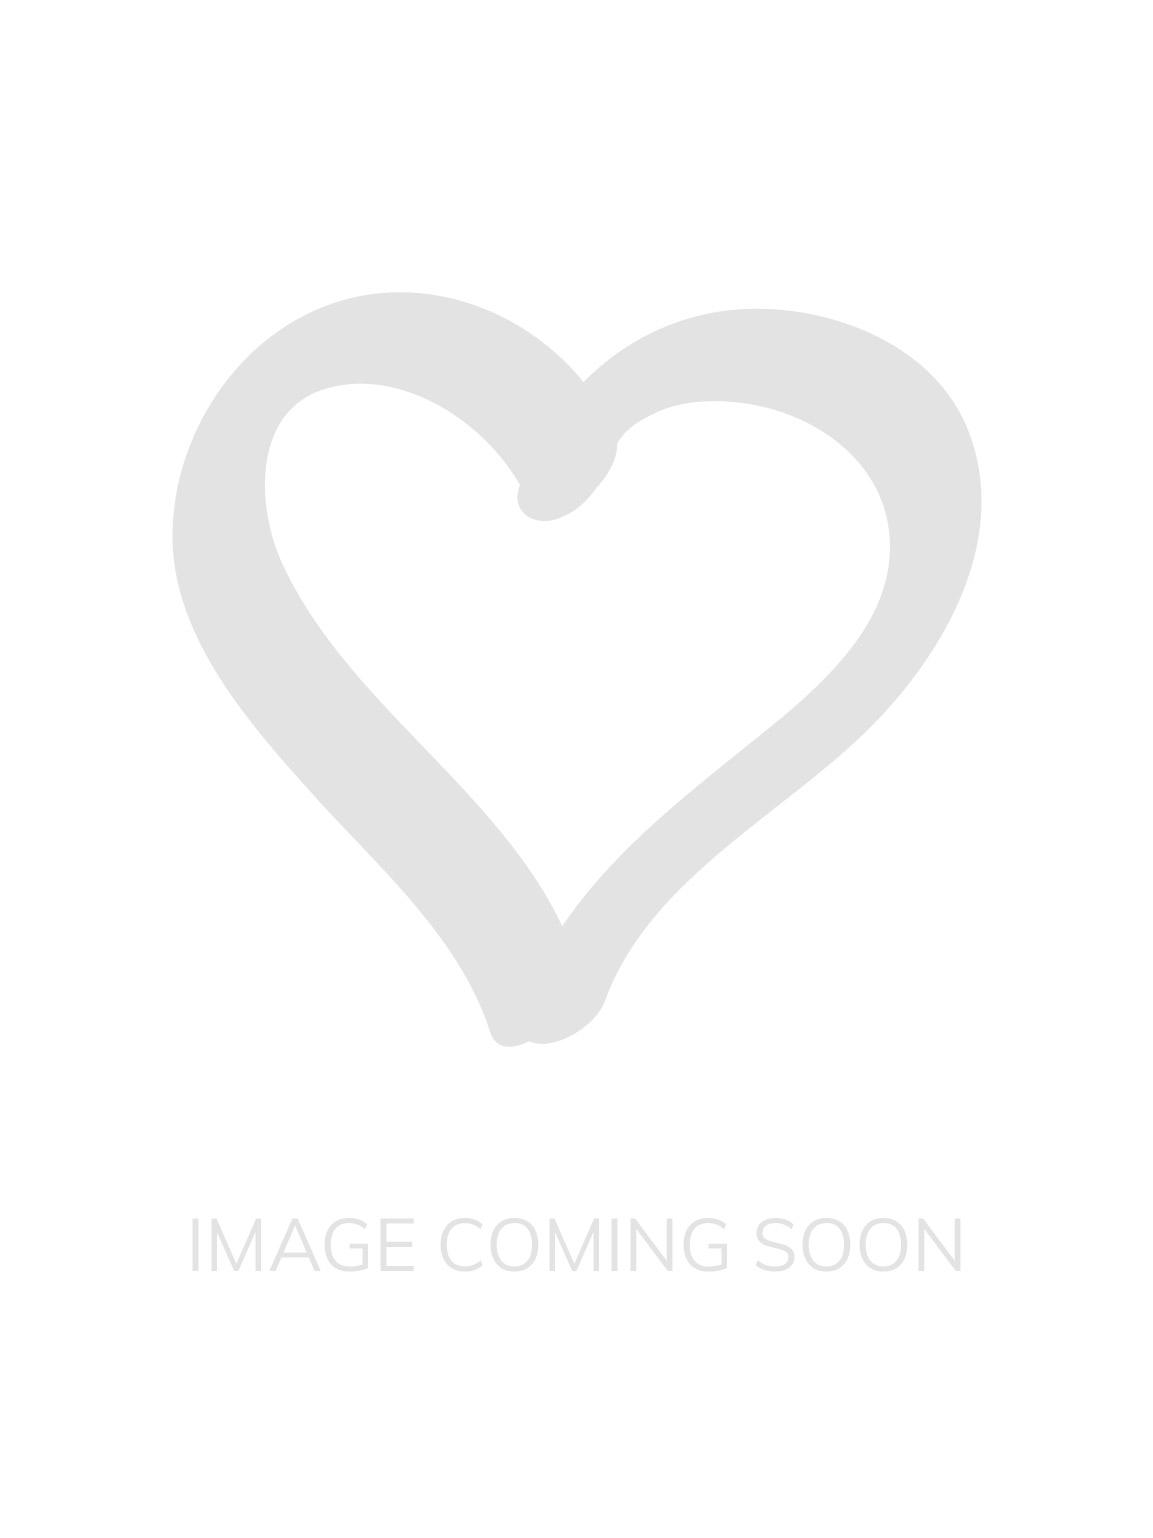 44925e99af Firm Foundations High Waist Brief - Latte Lift